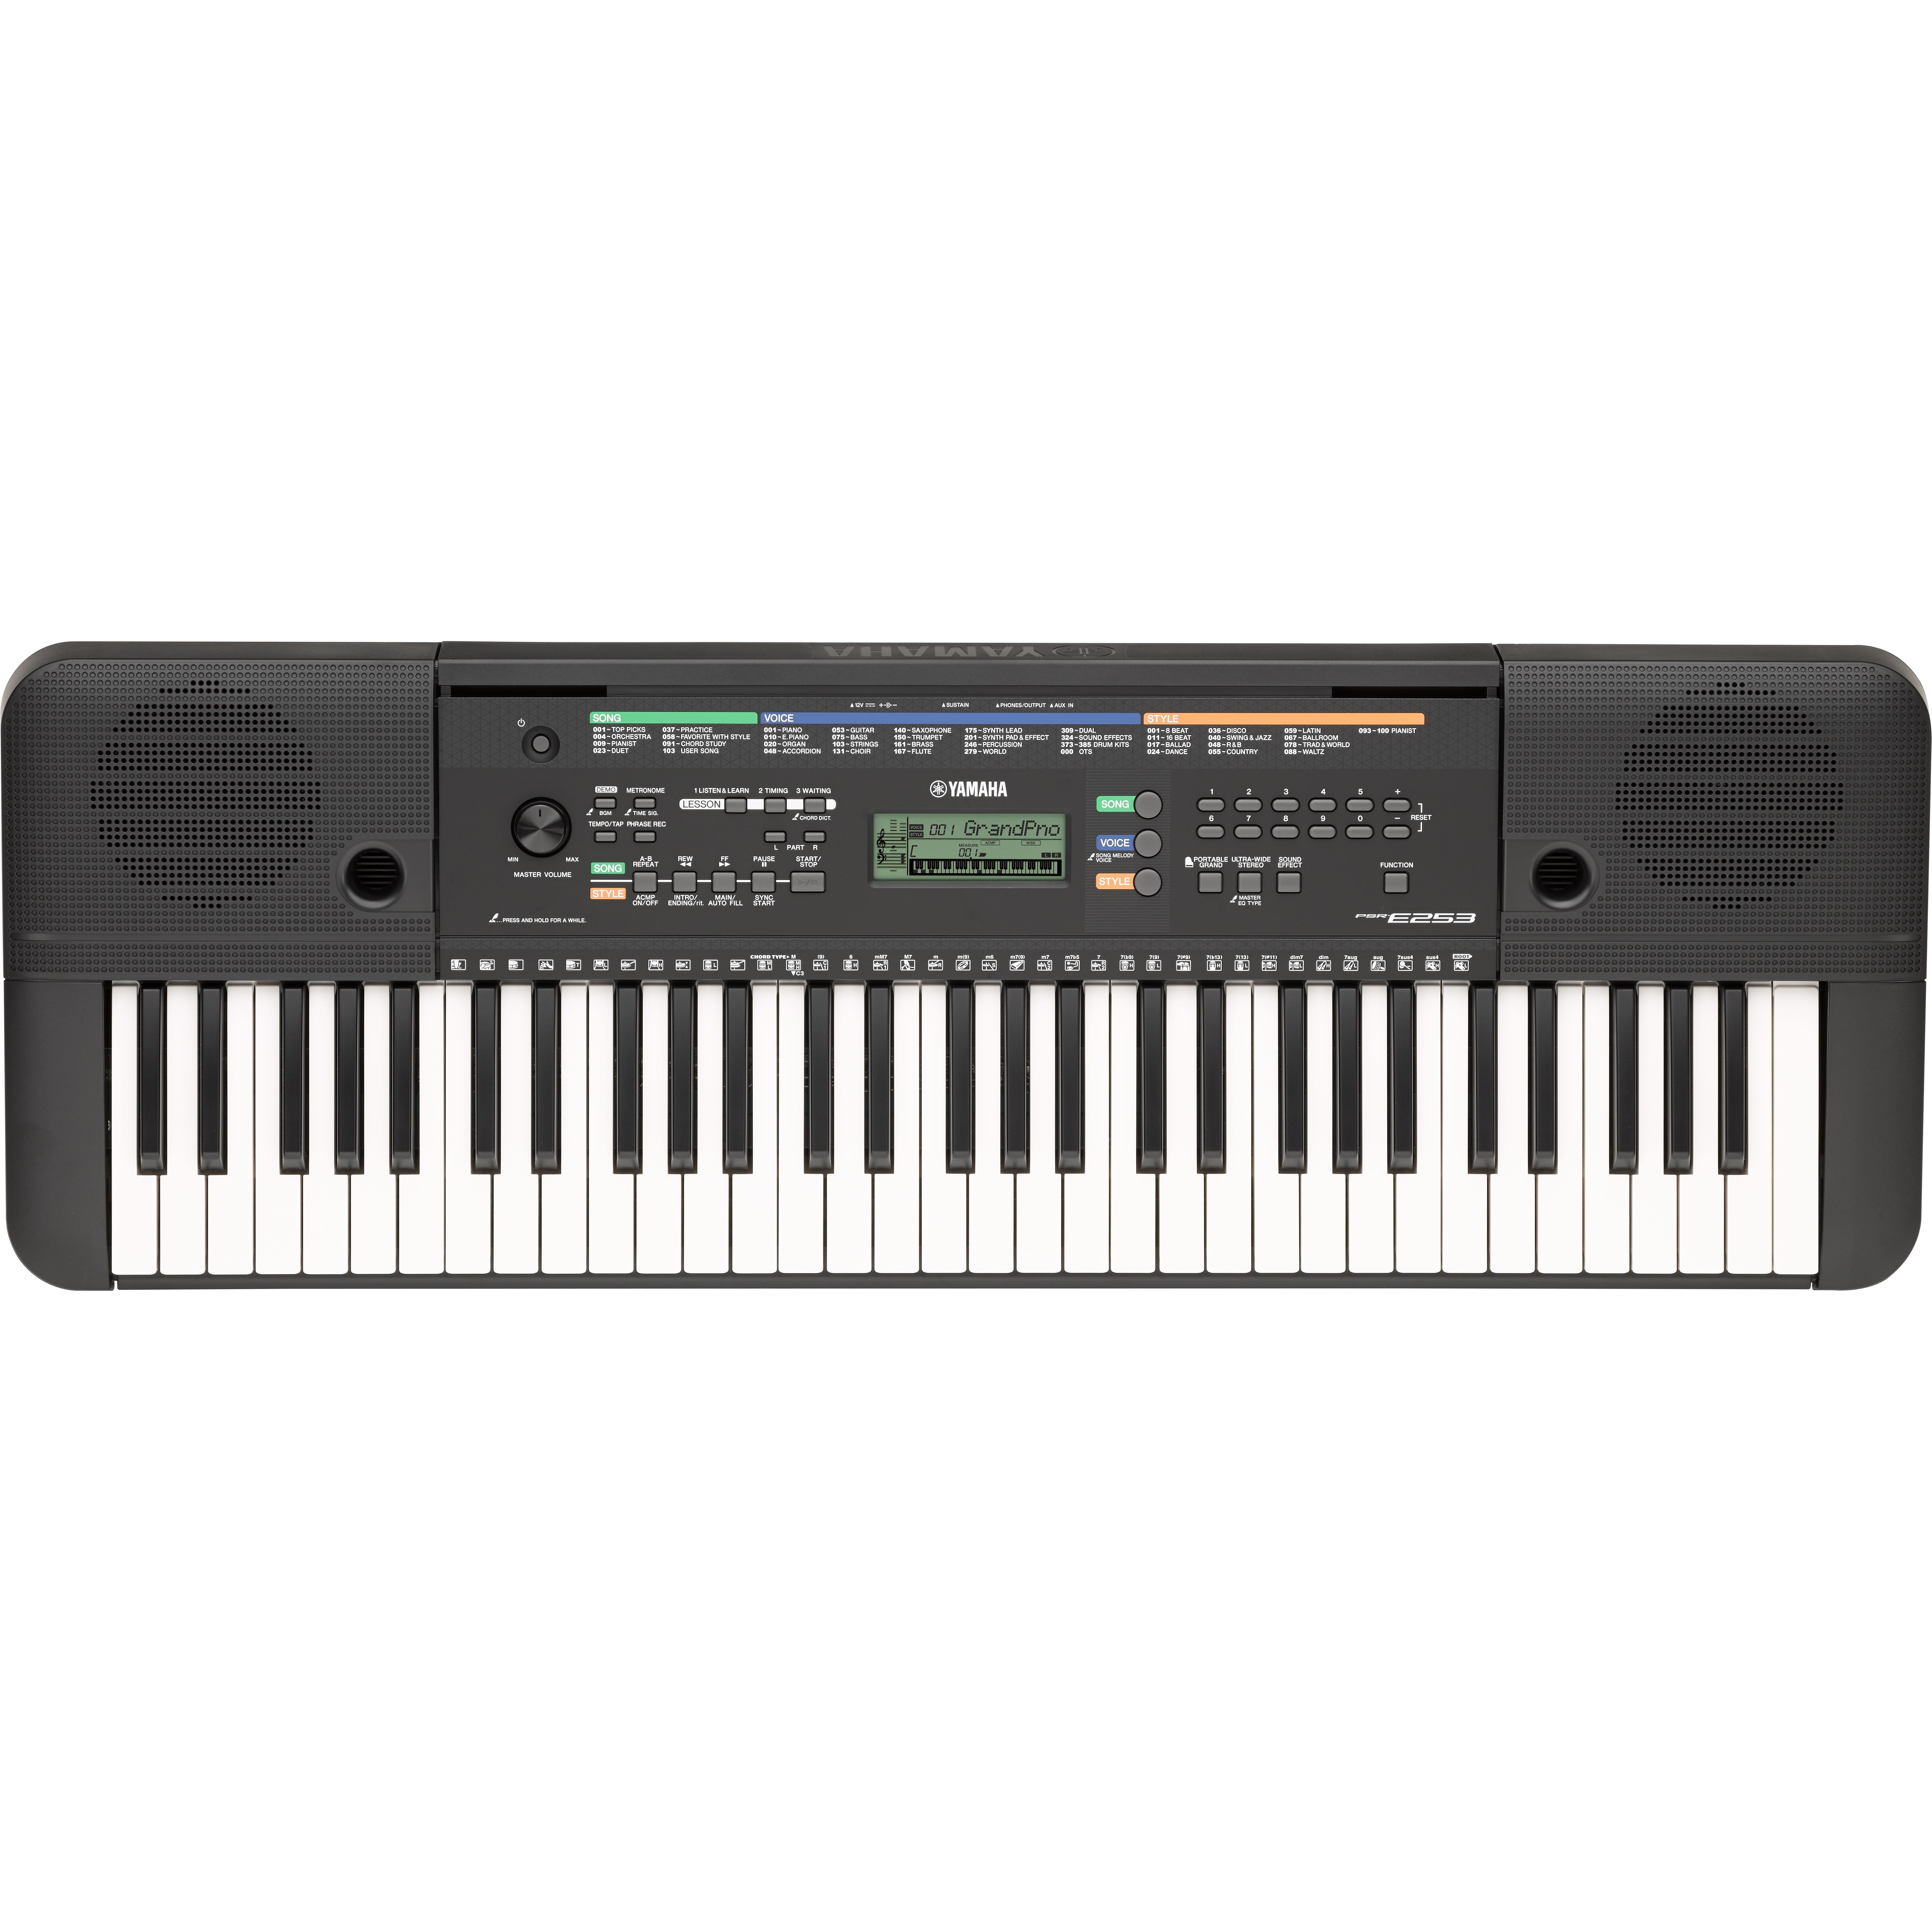 Yamaha psre253 61 key portable keyboard bundle for Yamaha keyboard amazon